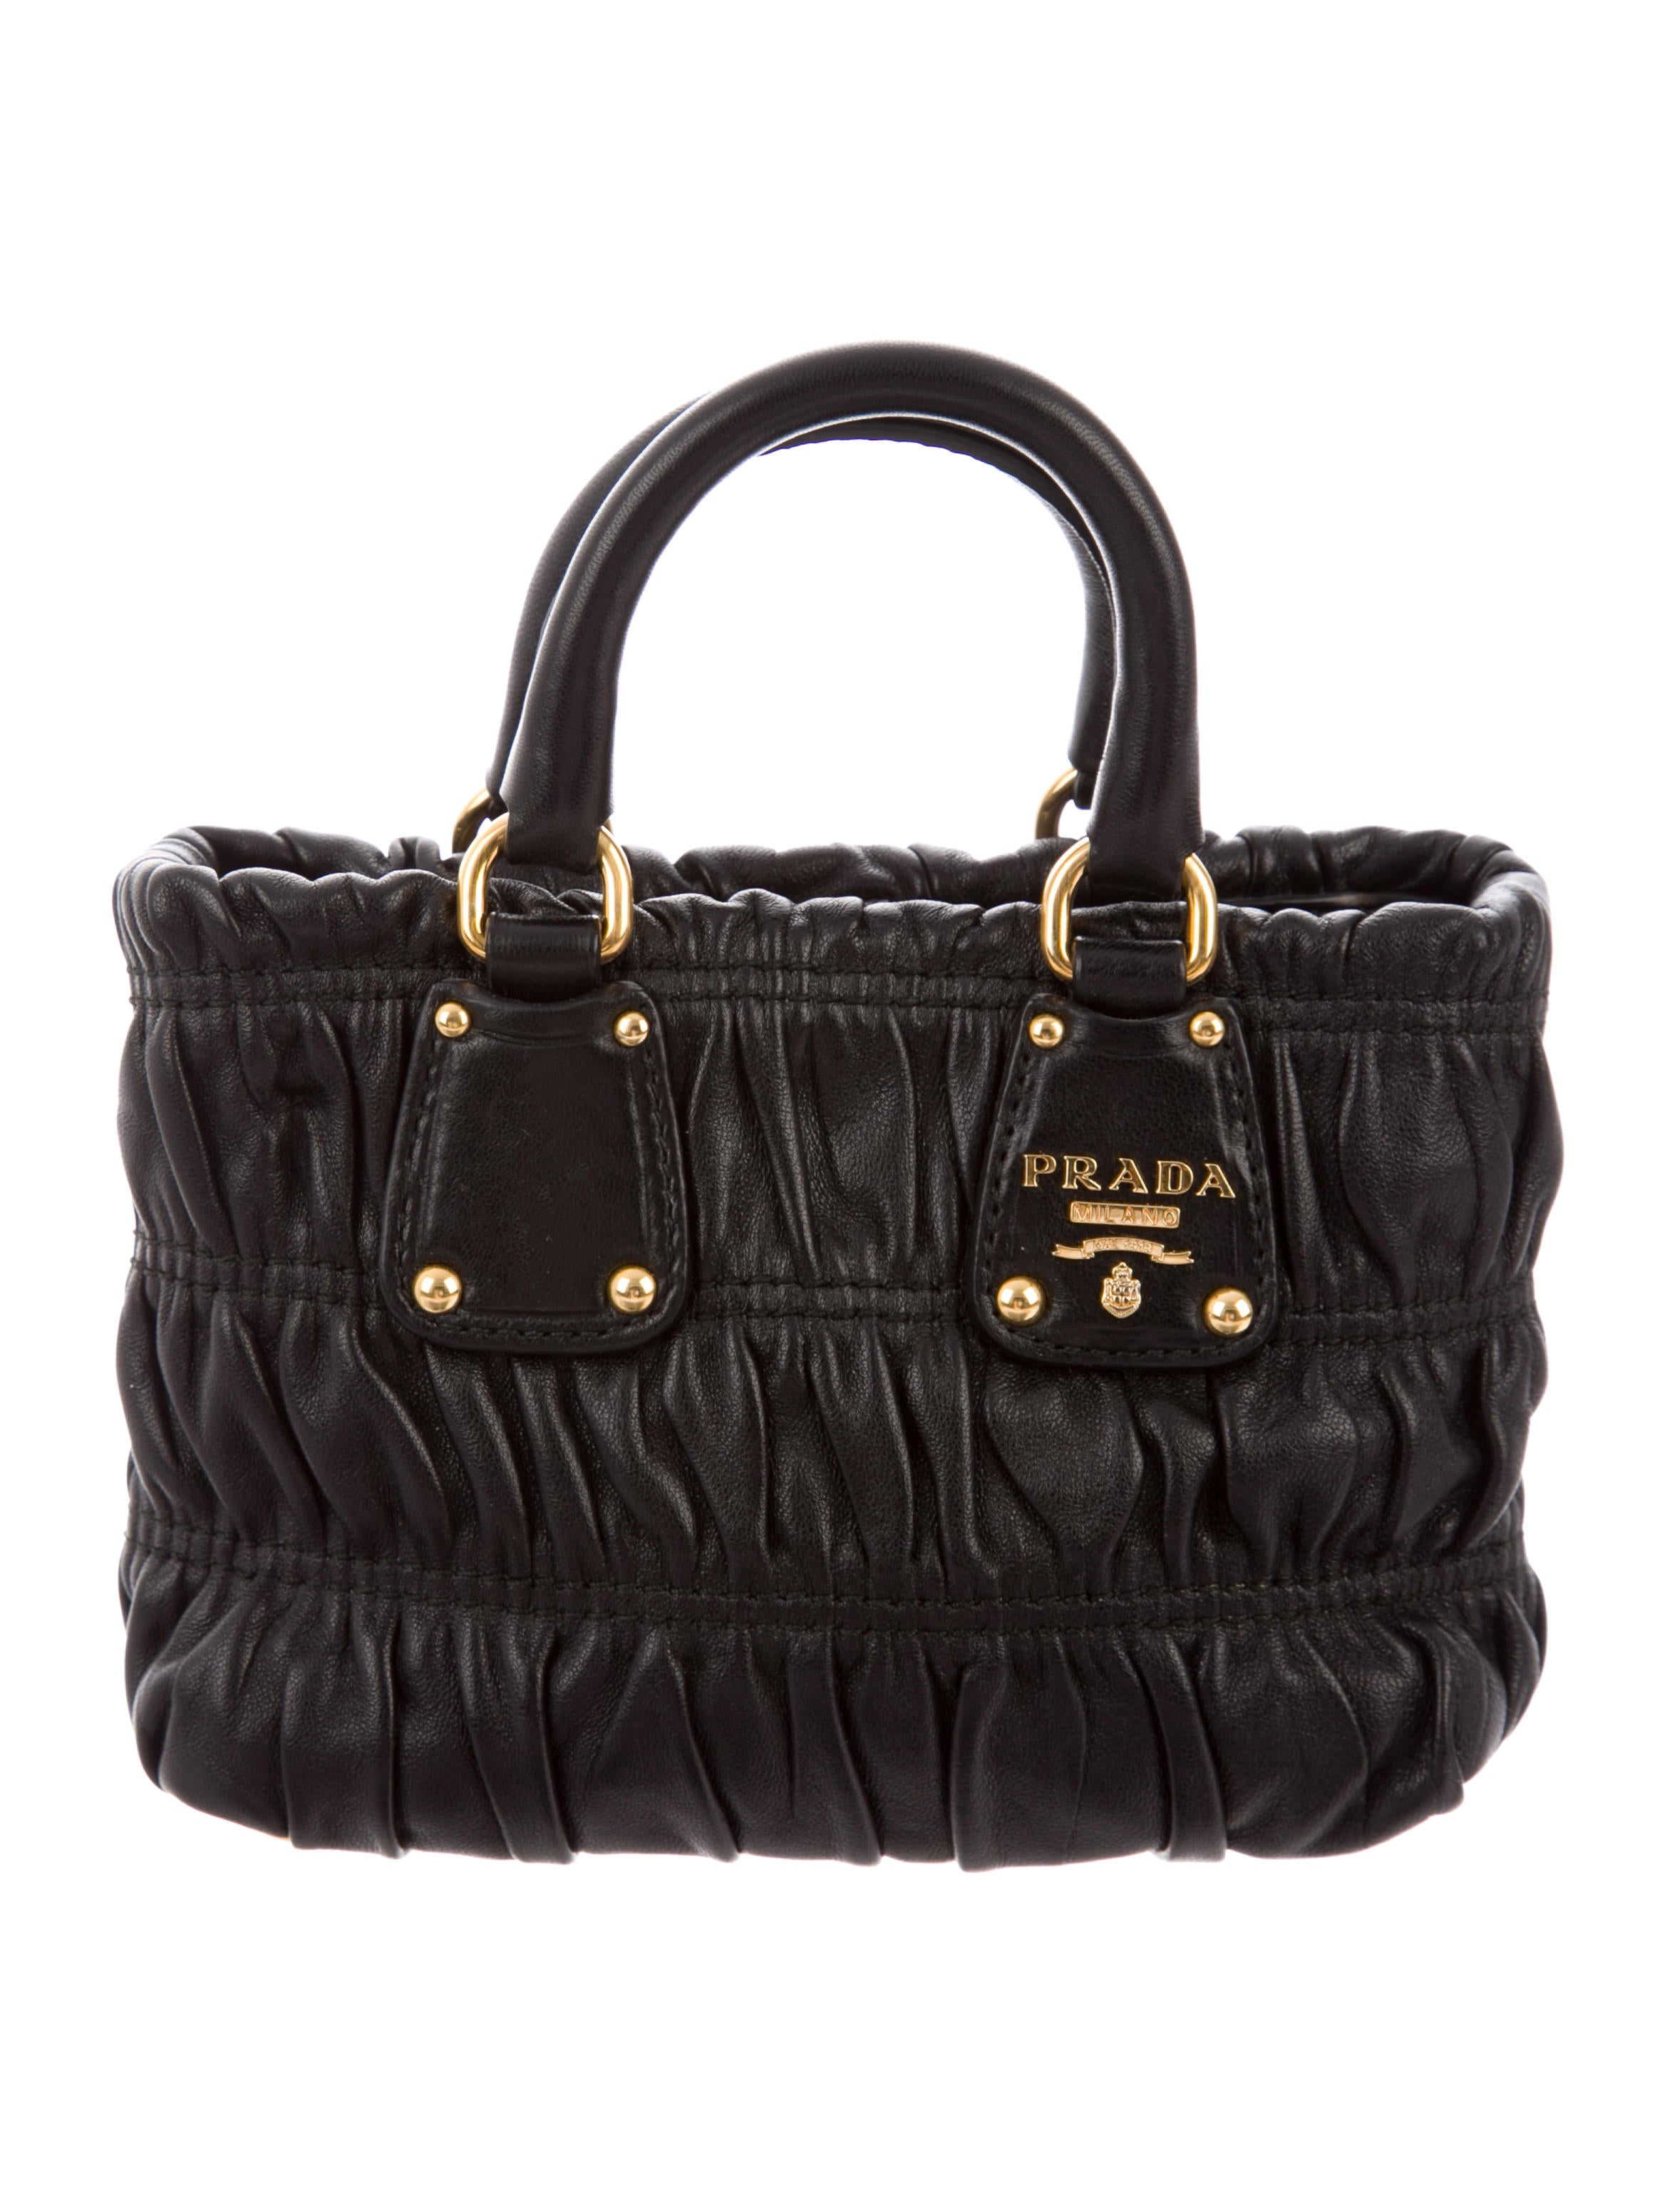 6f3d40b9b641 Prada Mini Nappa Gaufre Crossbody Bag - Handbags - PRA231562   The ...